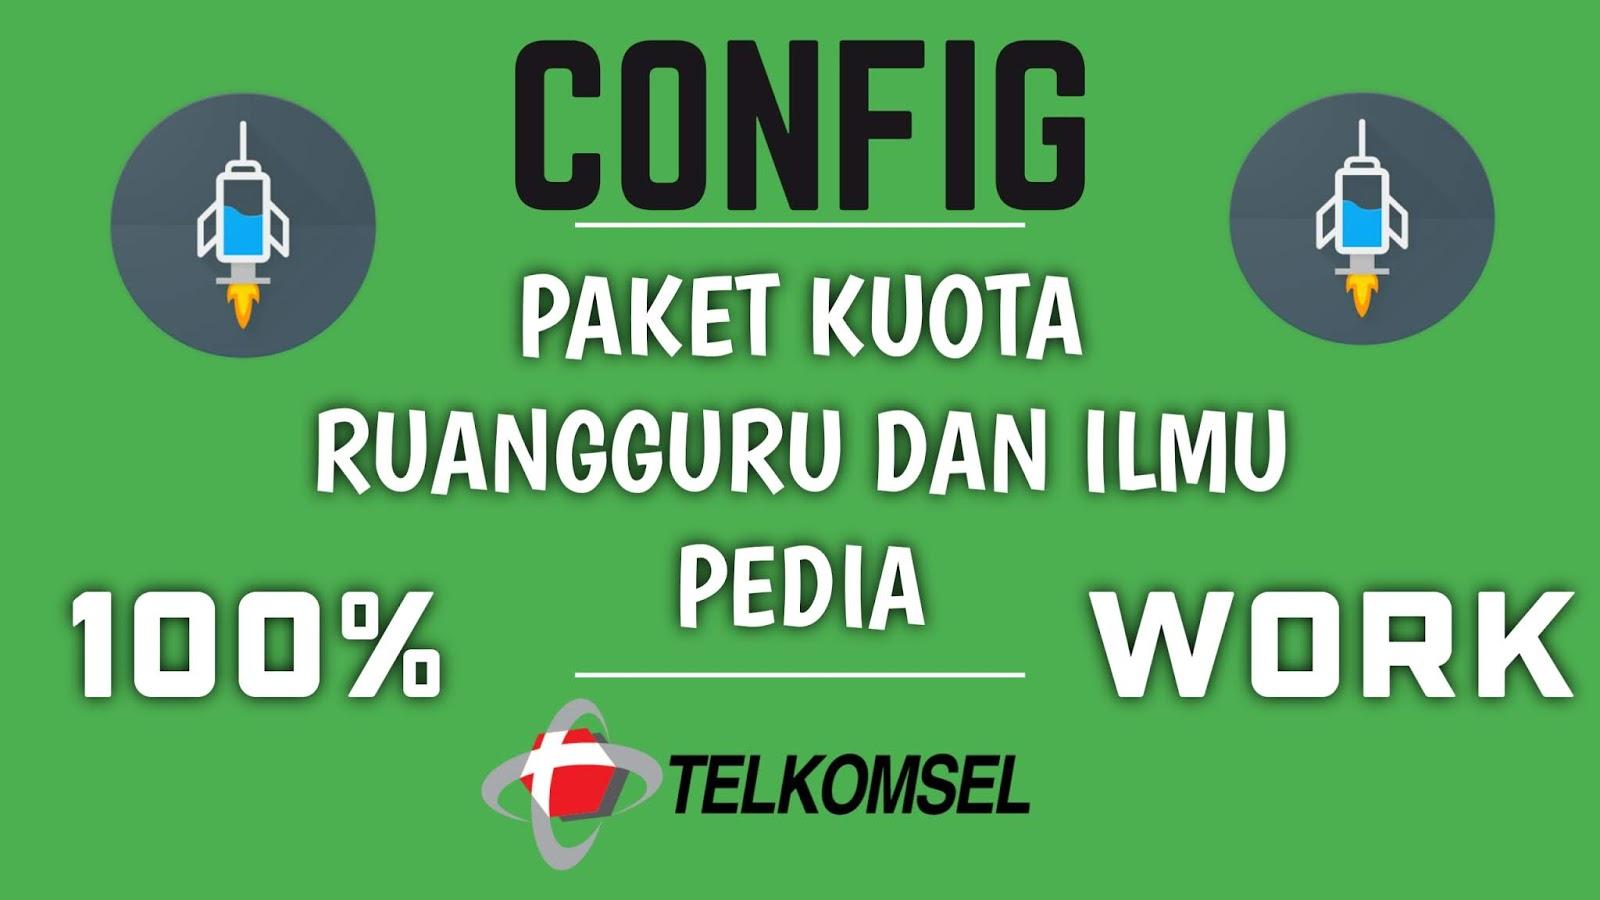 Download Config Paket Kuota Ruangguru dan Ilmupedia HTTP Injector Telkomsel 100% Work - Mastah Cyber